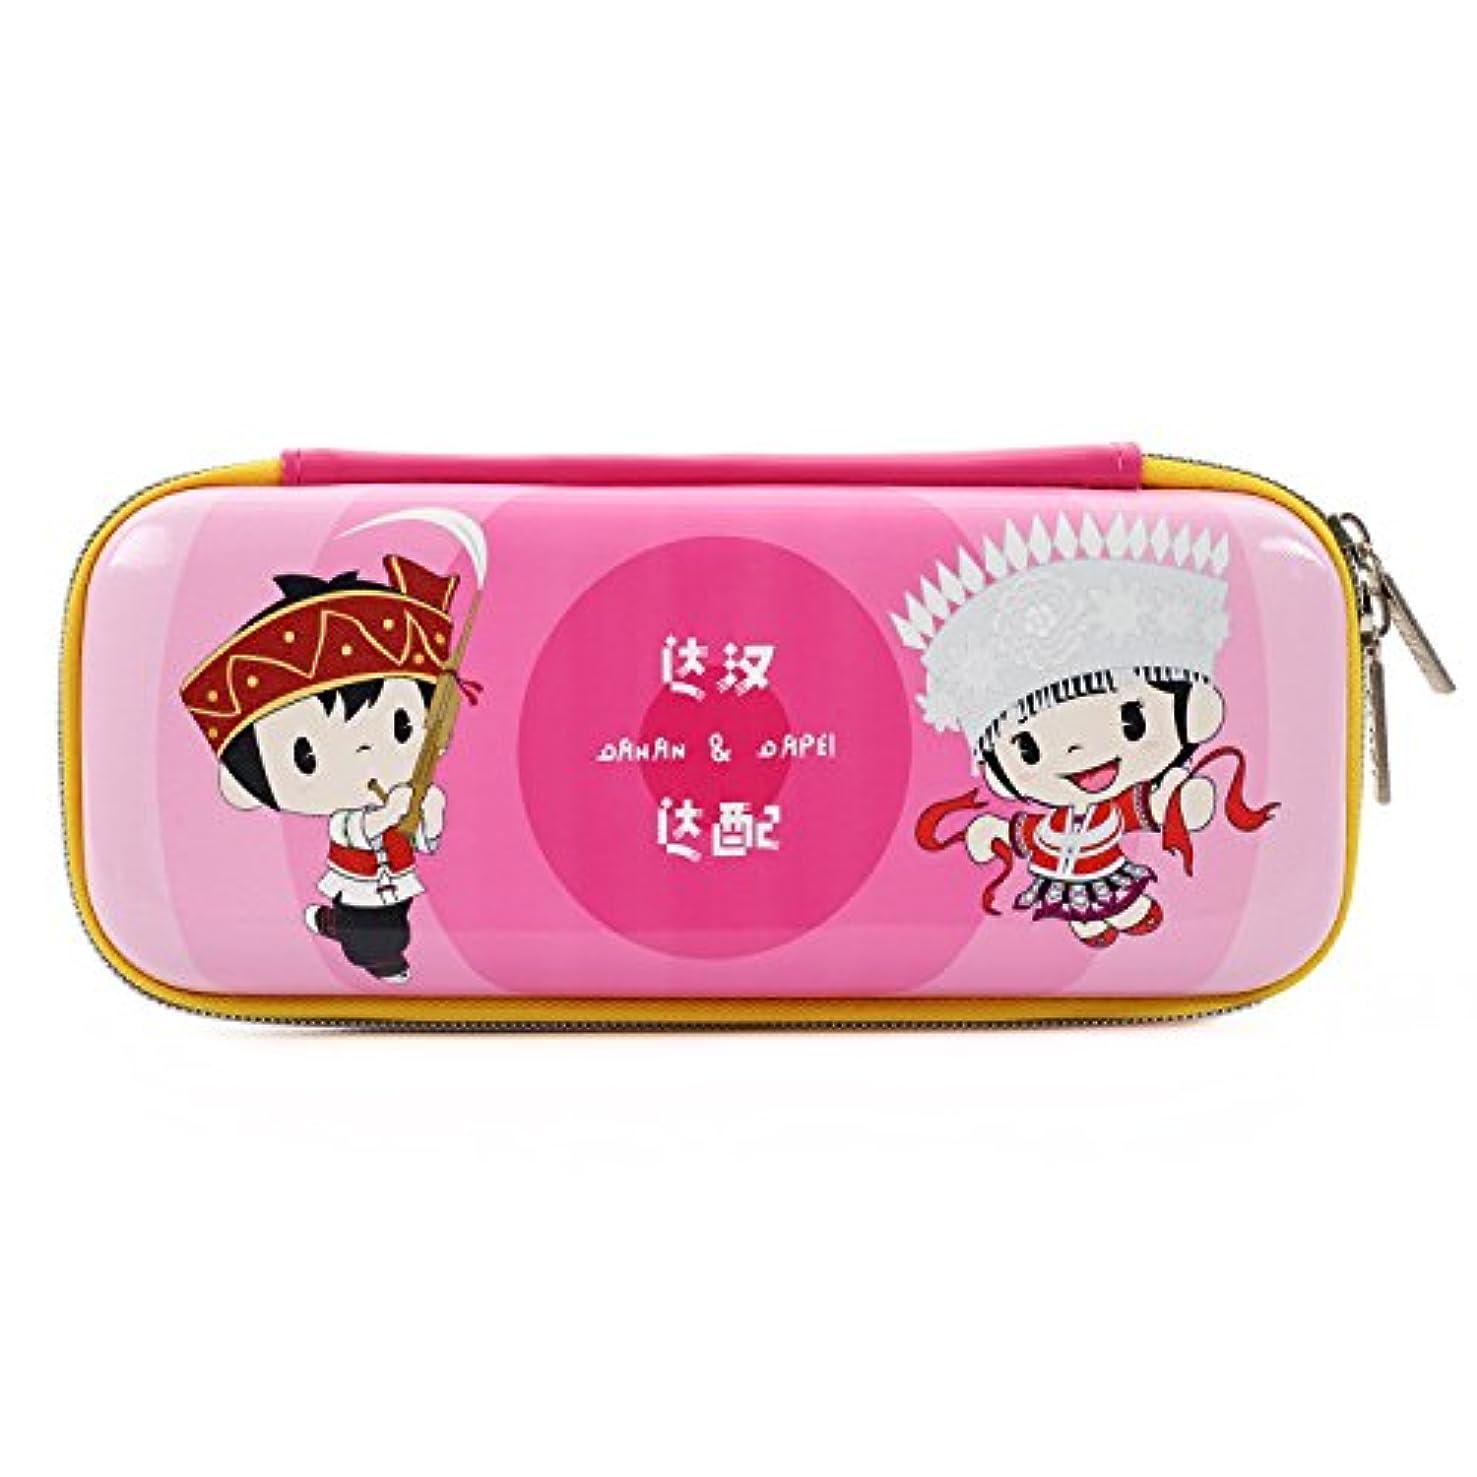 Cartoon Doll Pencil Case, PU Pencil Bag for Children Cute Pen Box Zipper Ballpoint Pen Pouch for Gel Pens, Markers, Colored Pencil Pink